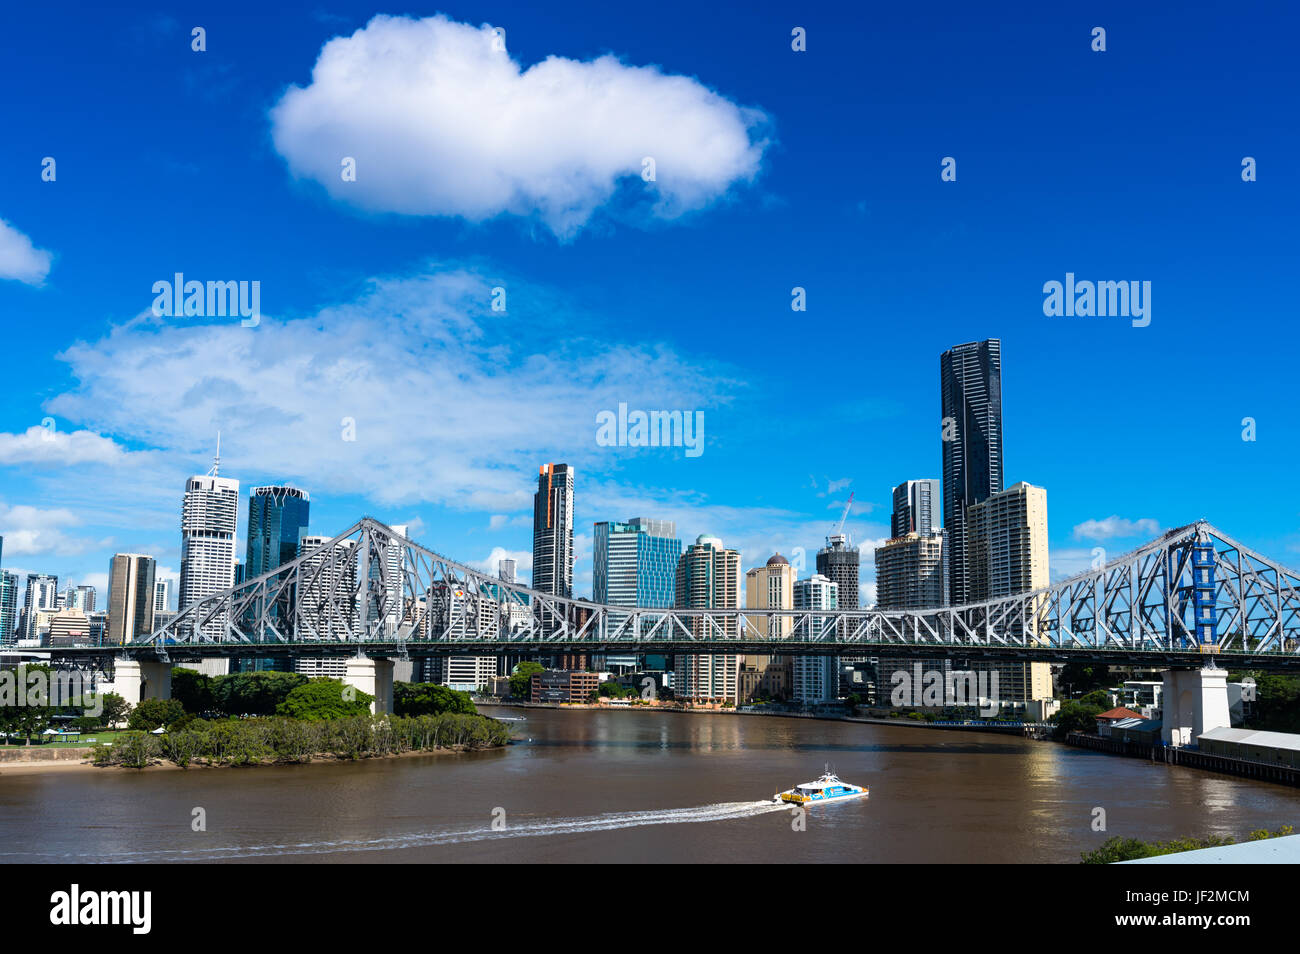 Brisbane city skyline with Story bridge. Queensland. Australia. - Stock Image